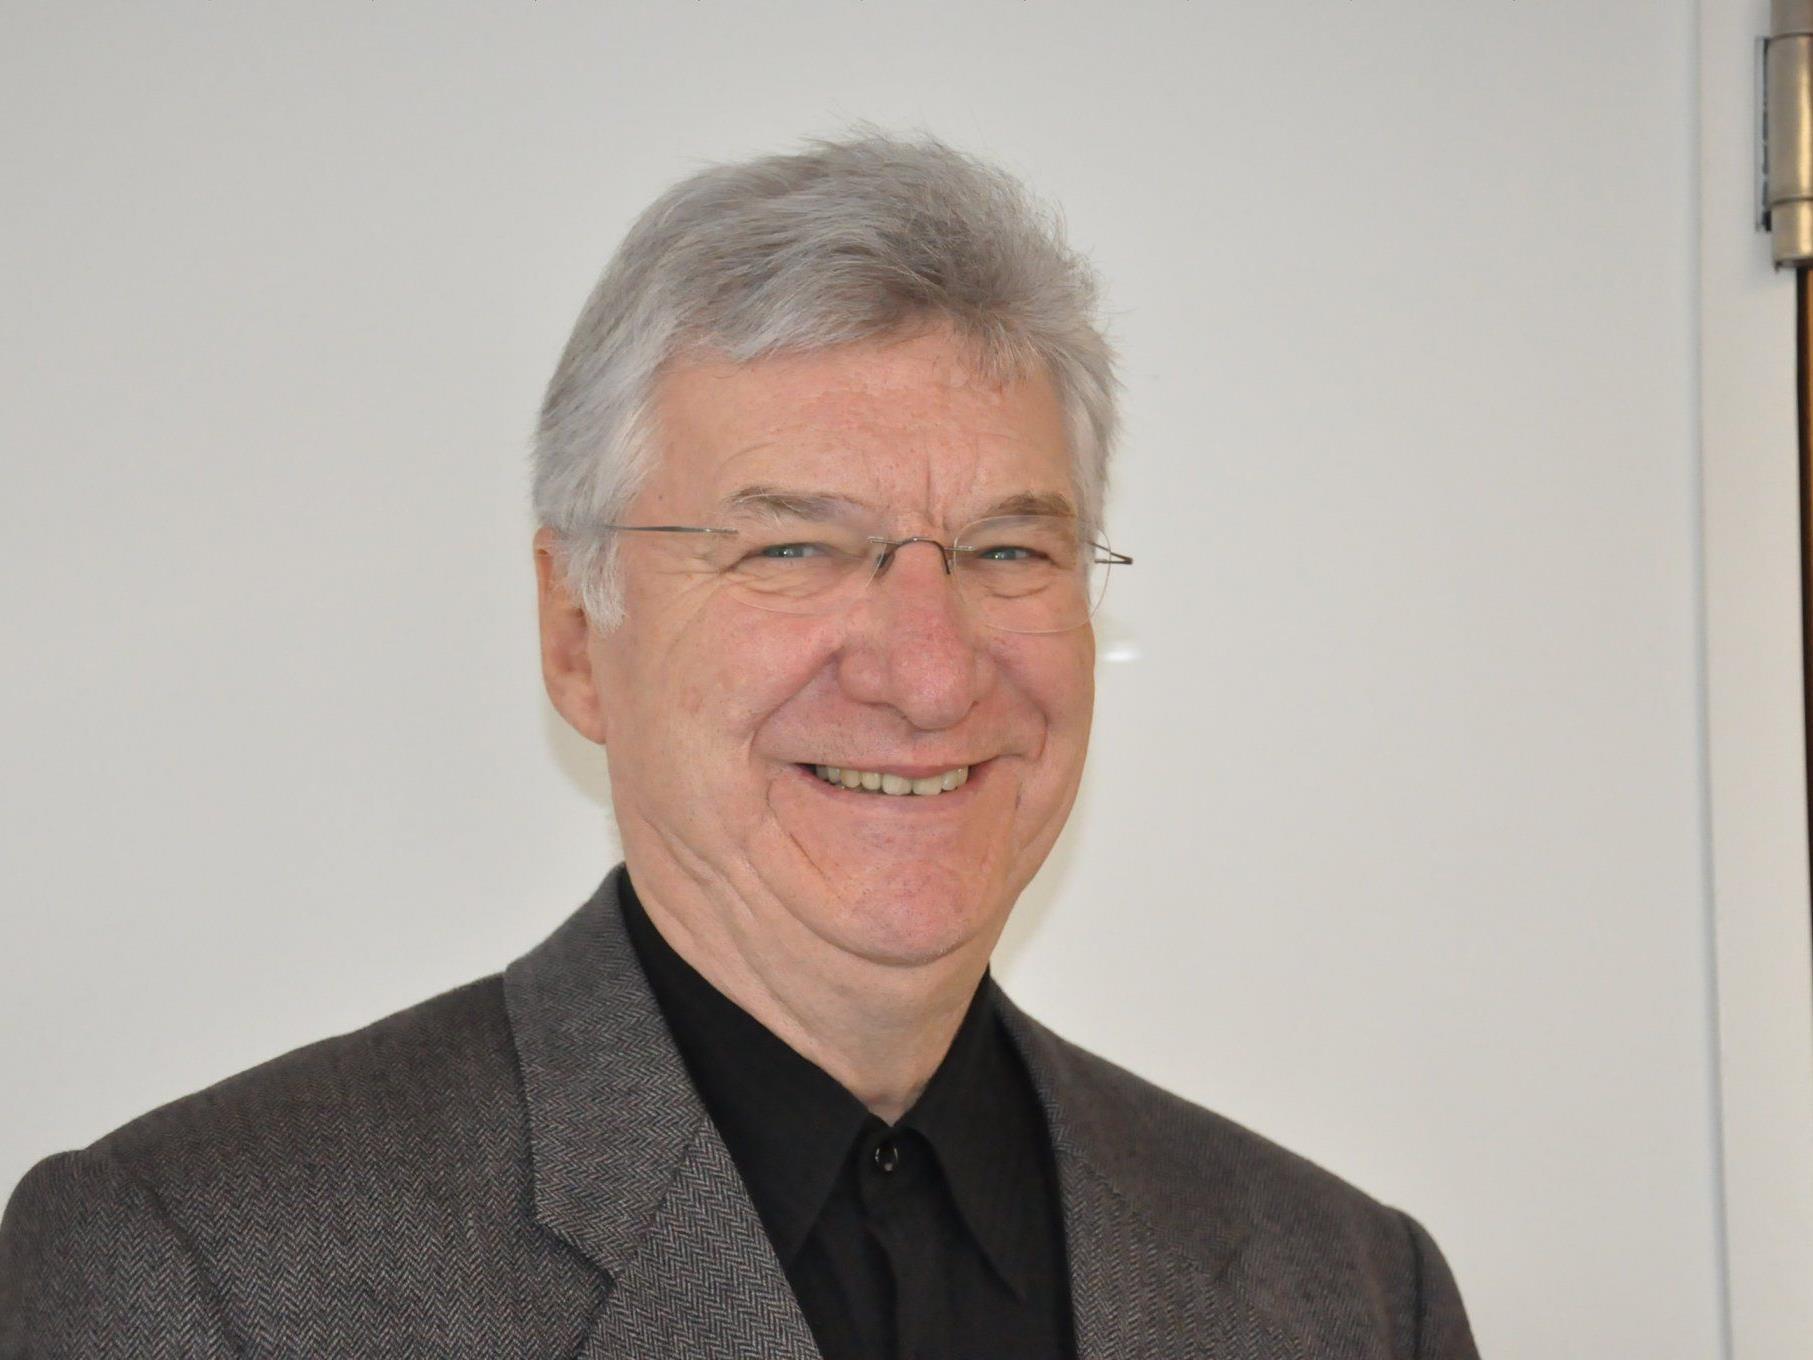 Dompfarrer Rudolf Bischof